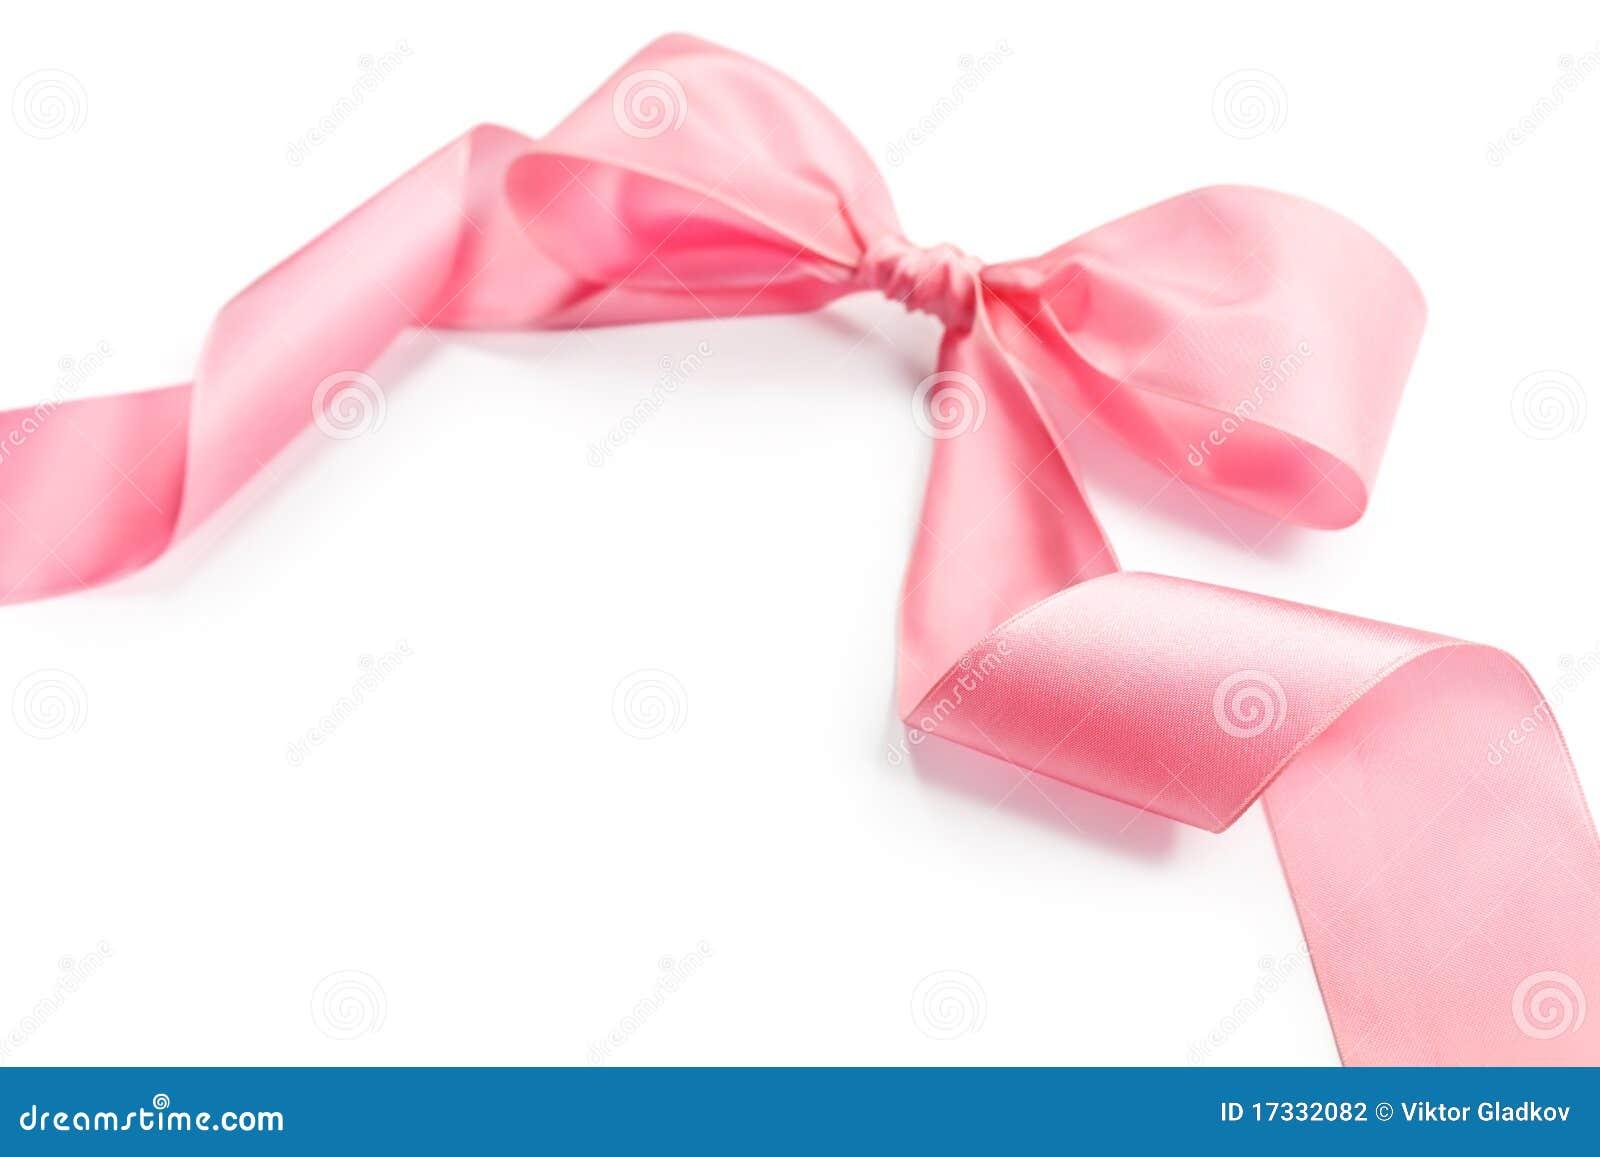 Shiny Pink Satin Holiday Ribbon And Bow Stock Photo - Image of gift ... 8b002ace32f